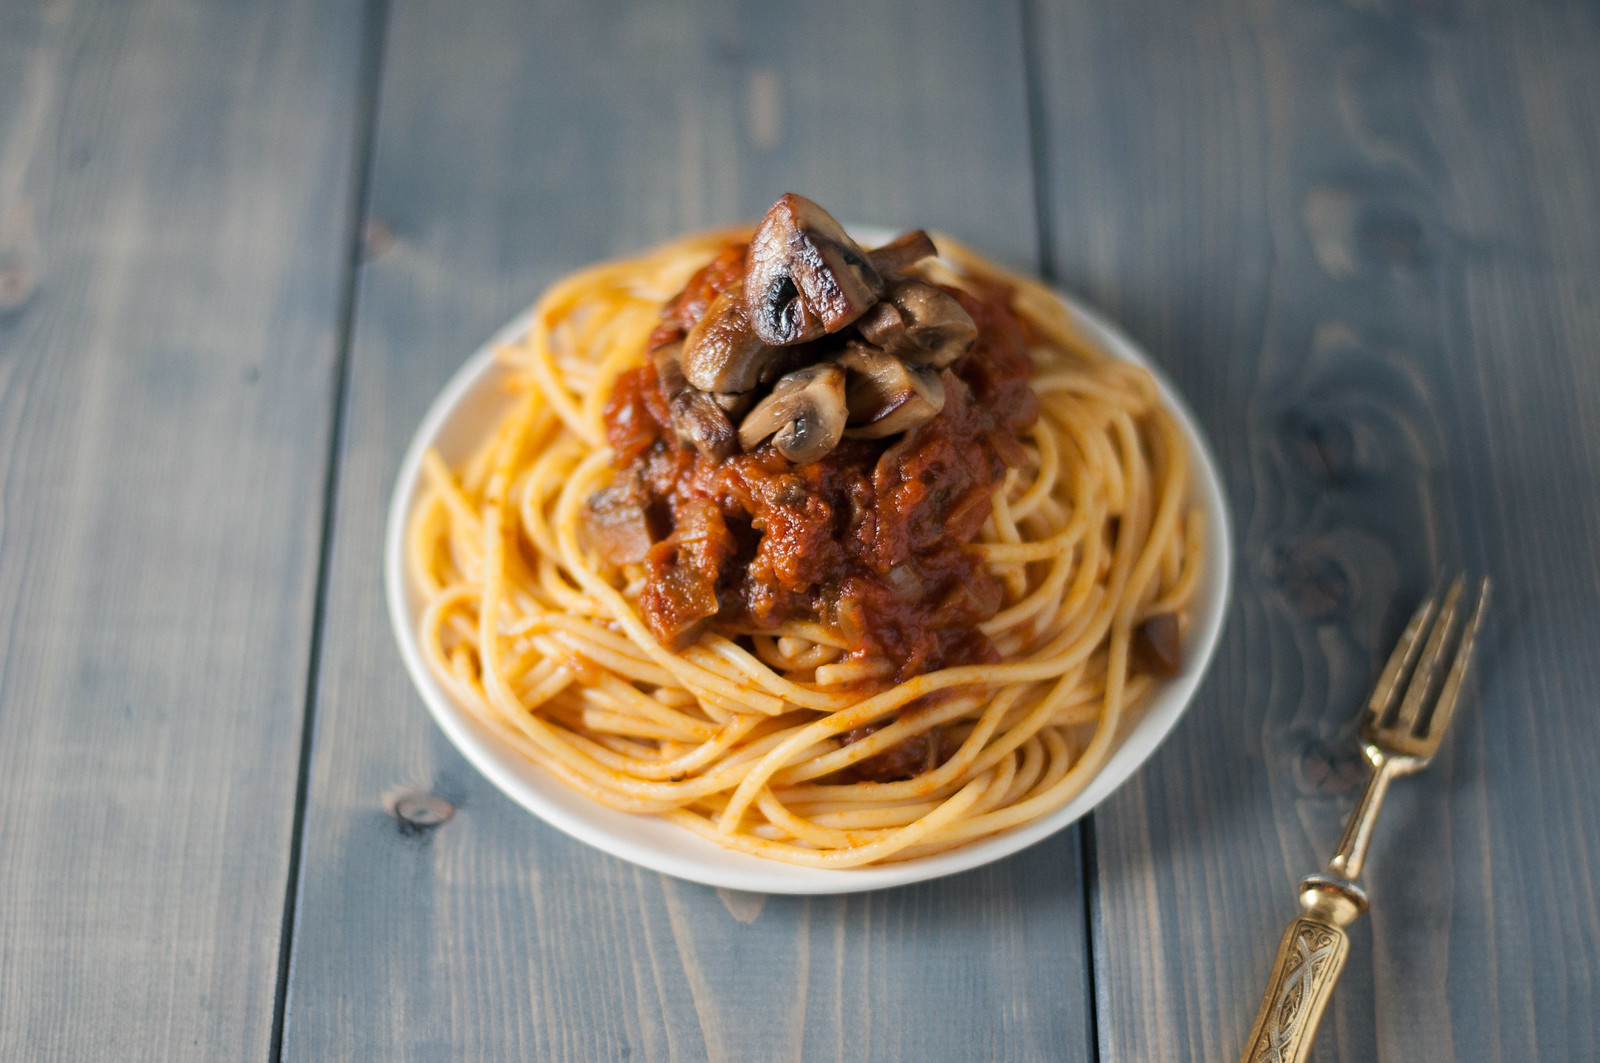 Spaghetti pile with mushrooms